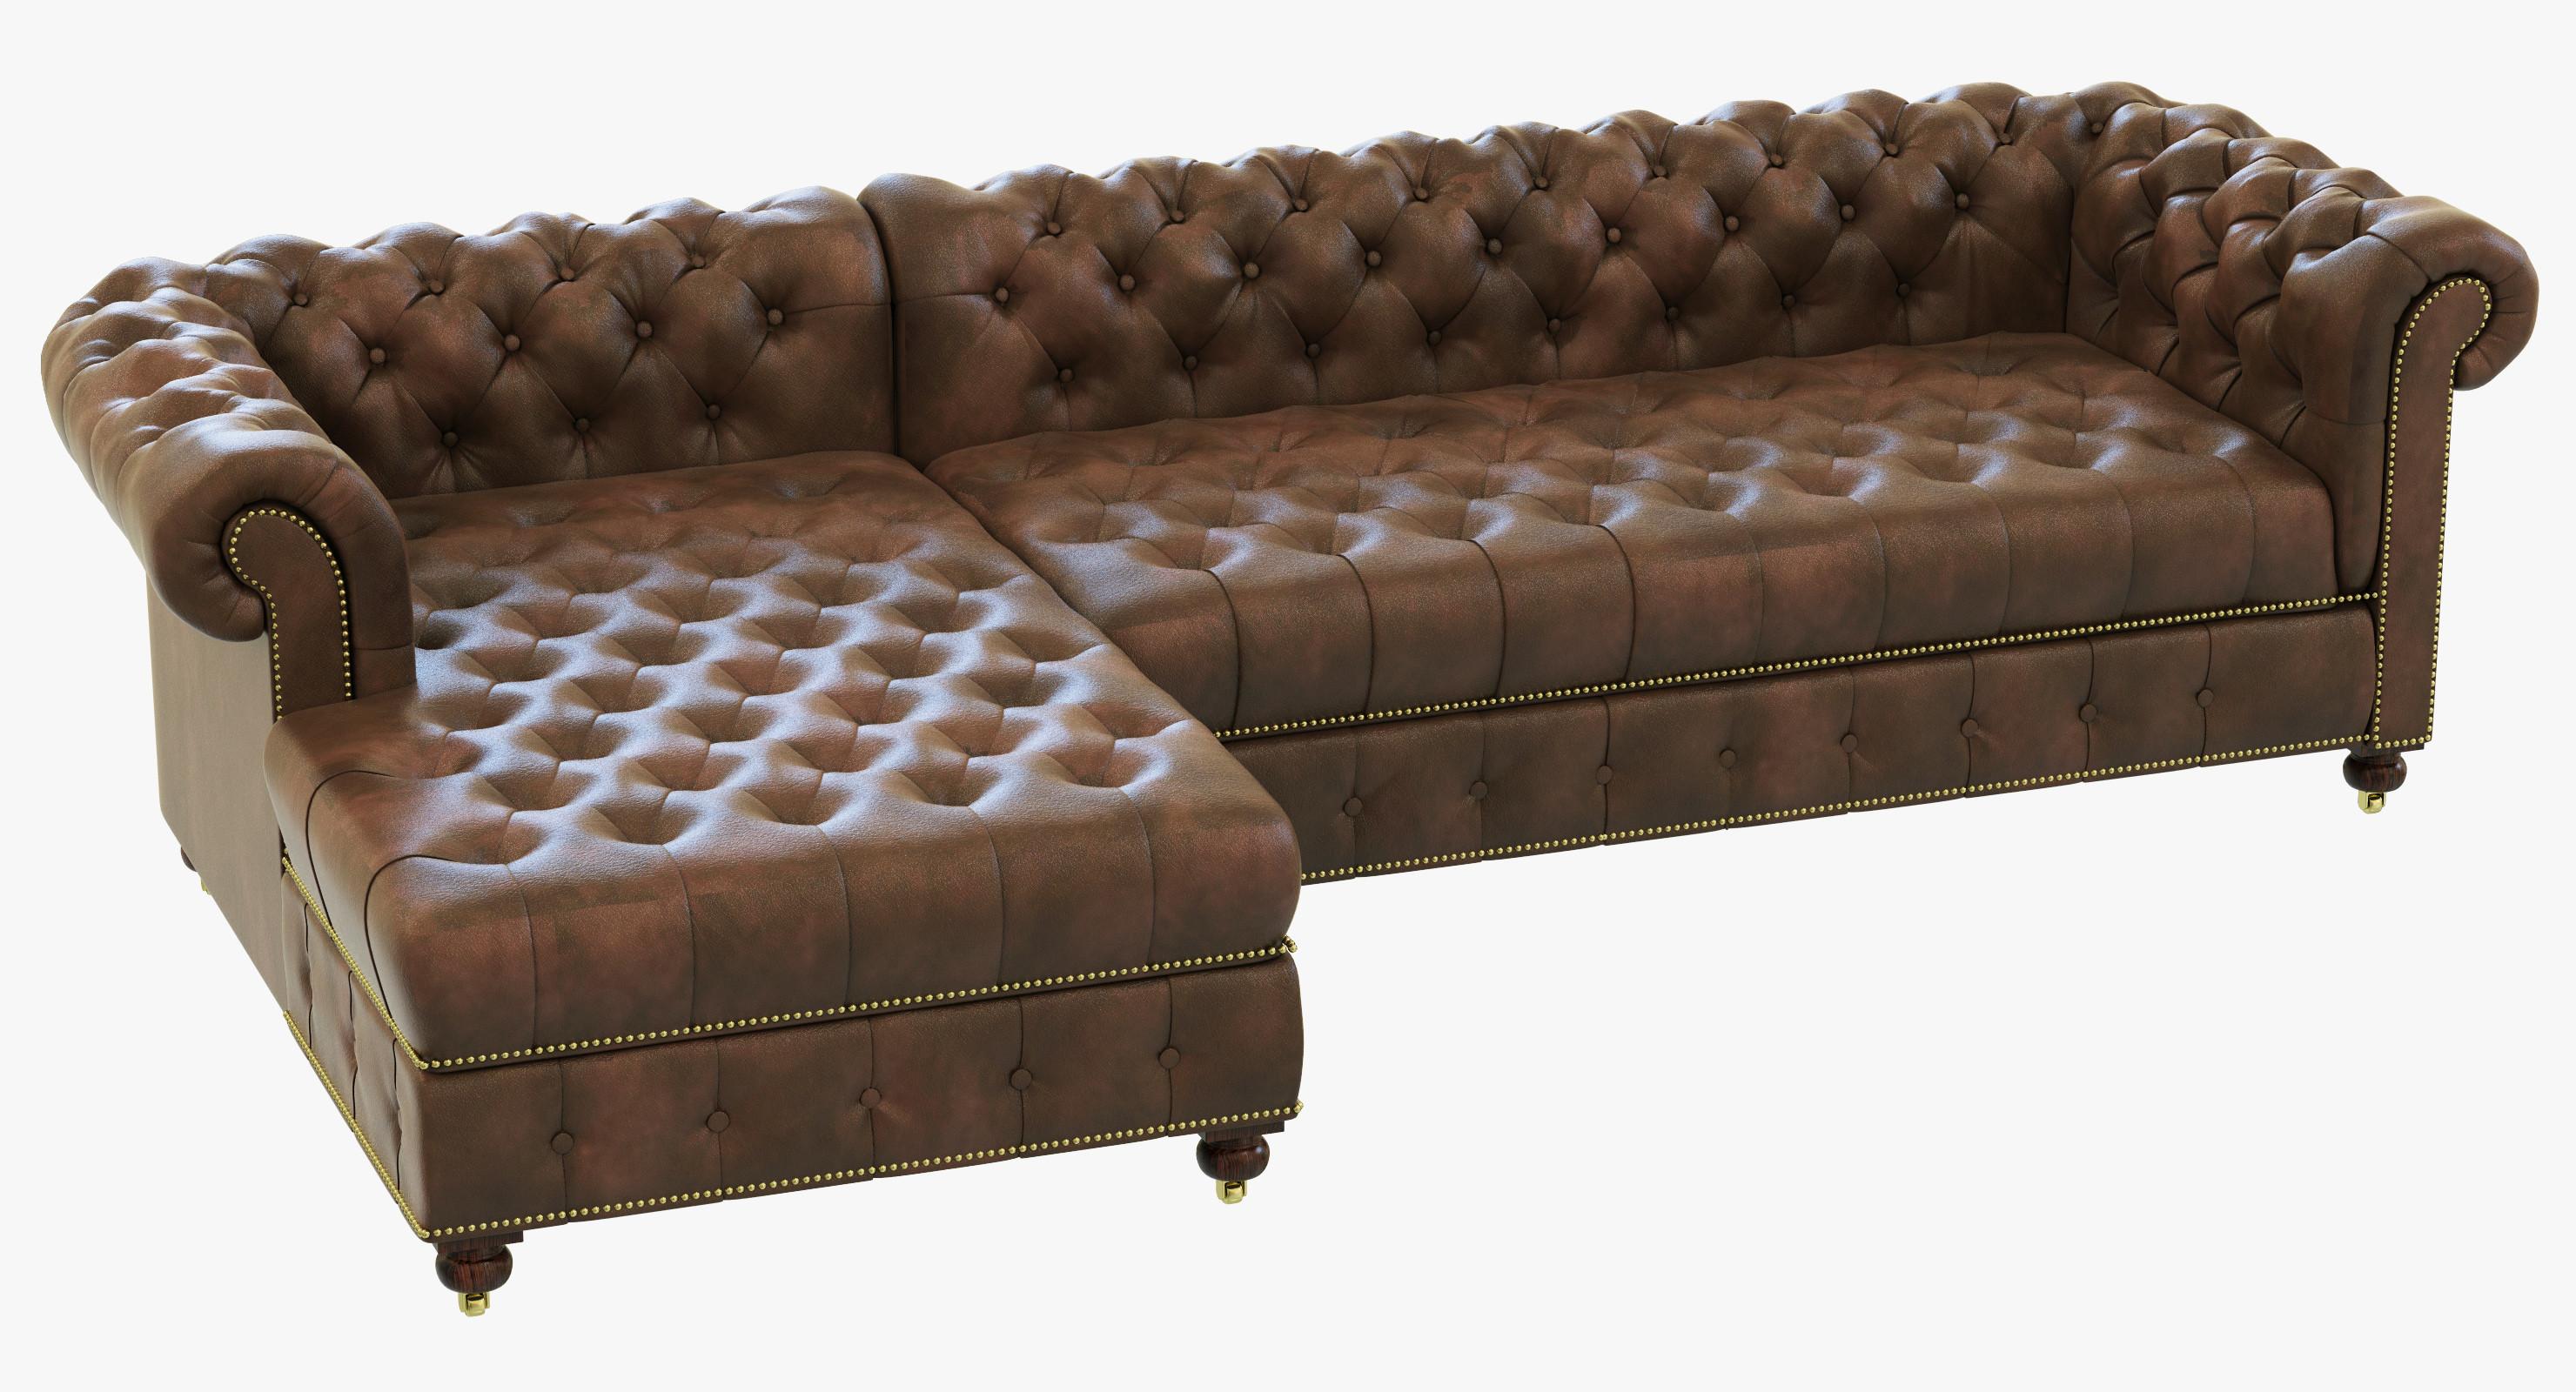 Restoration Hardware Cambridge Leather Left-Arm Sofa Chaise Sectional2.jpg